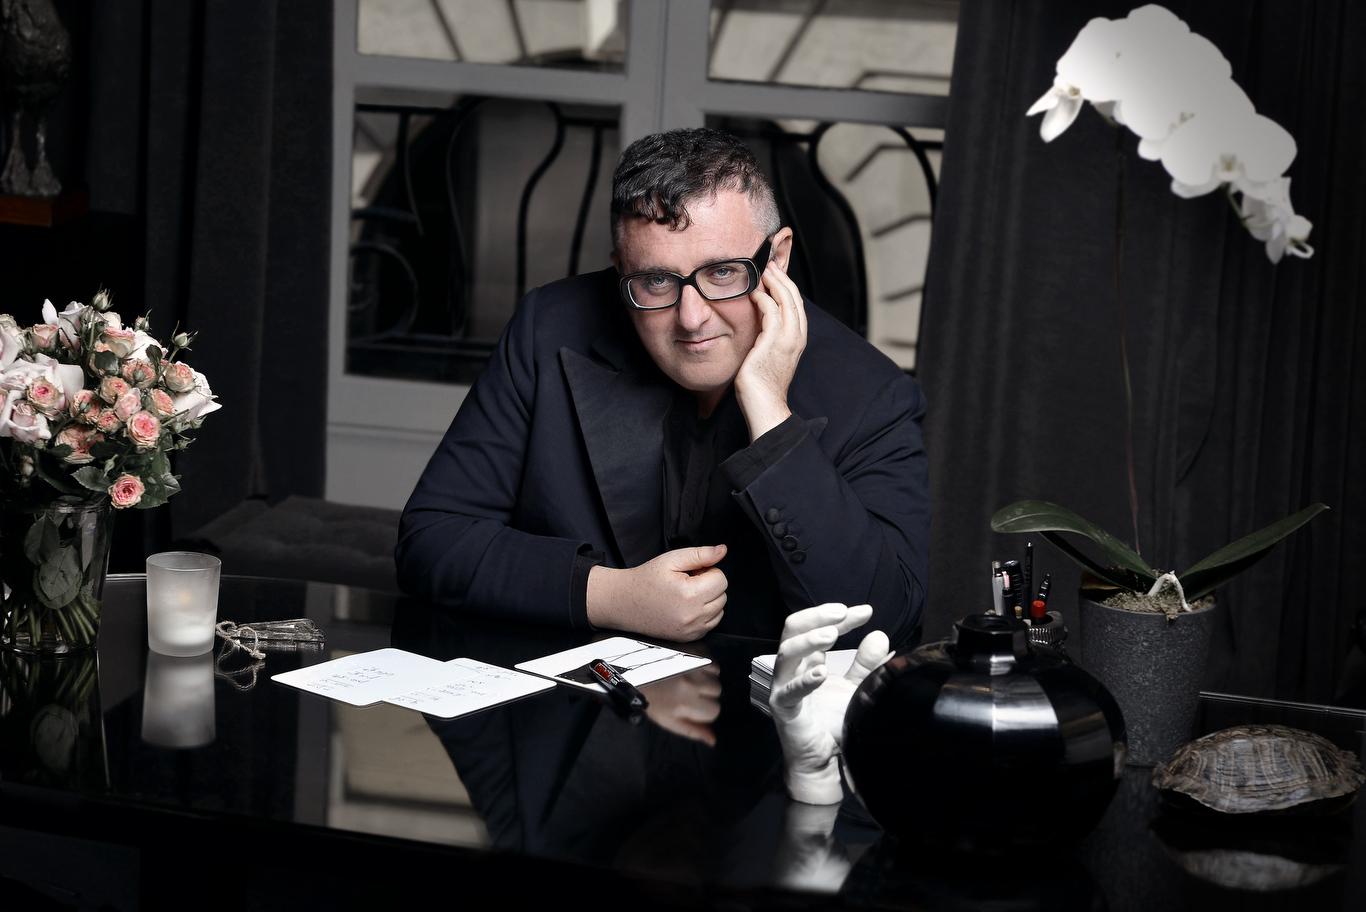 Alber Elbaz at his desk.